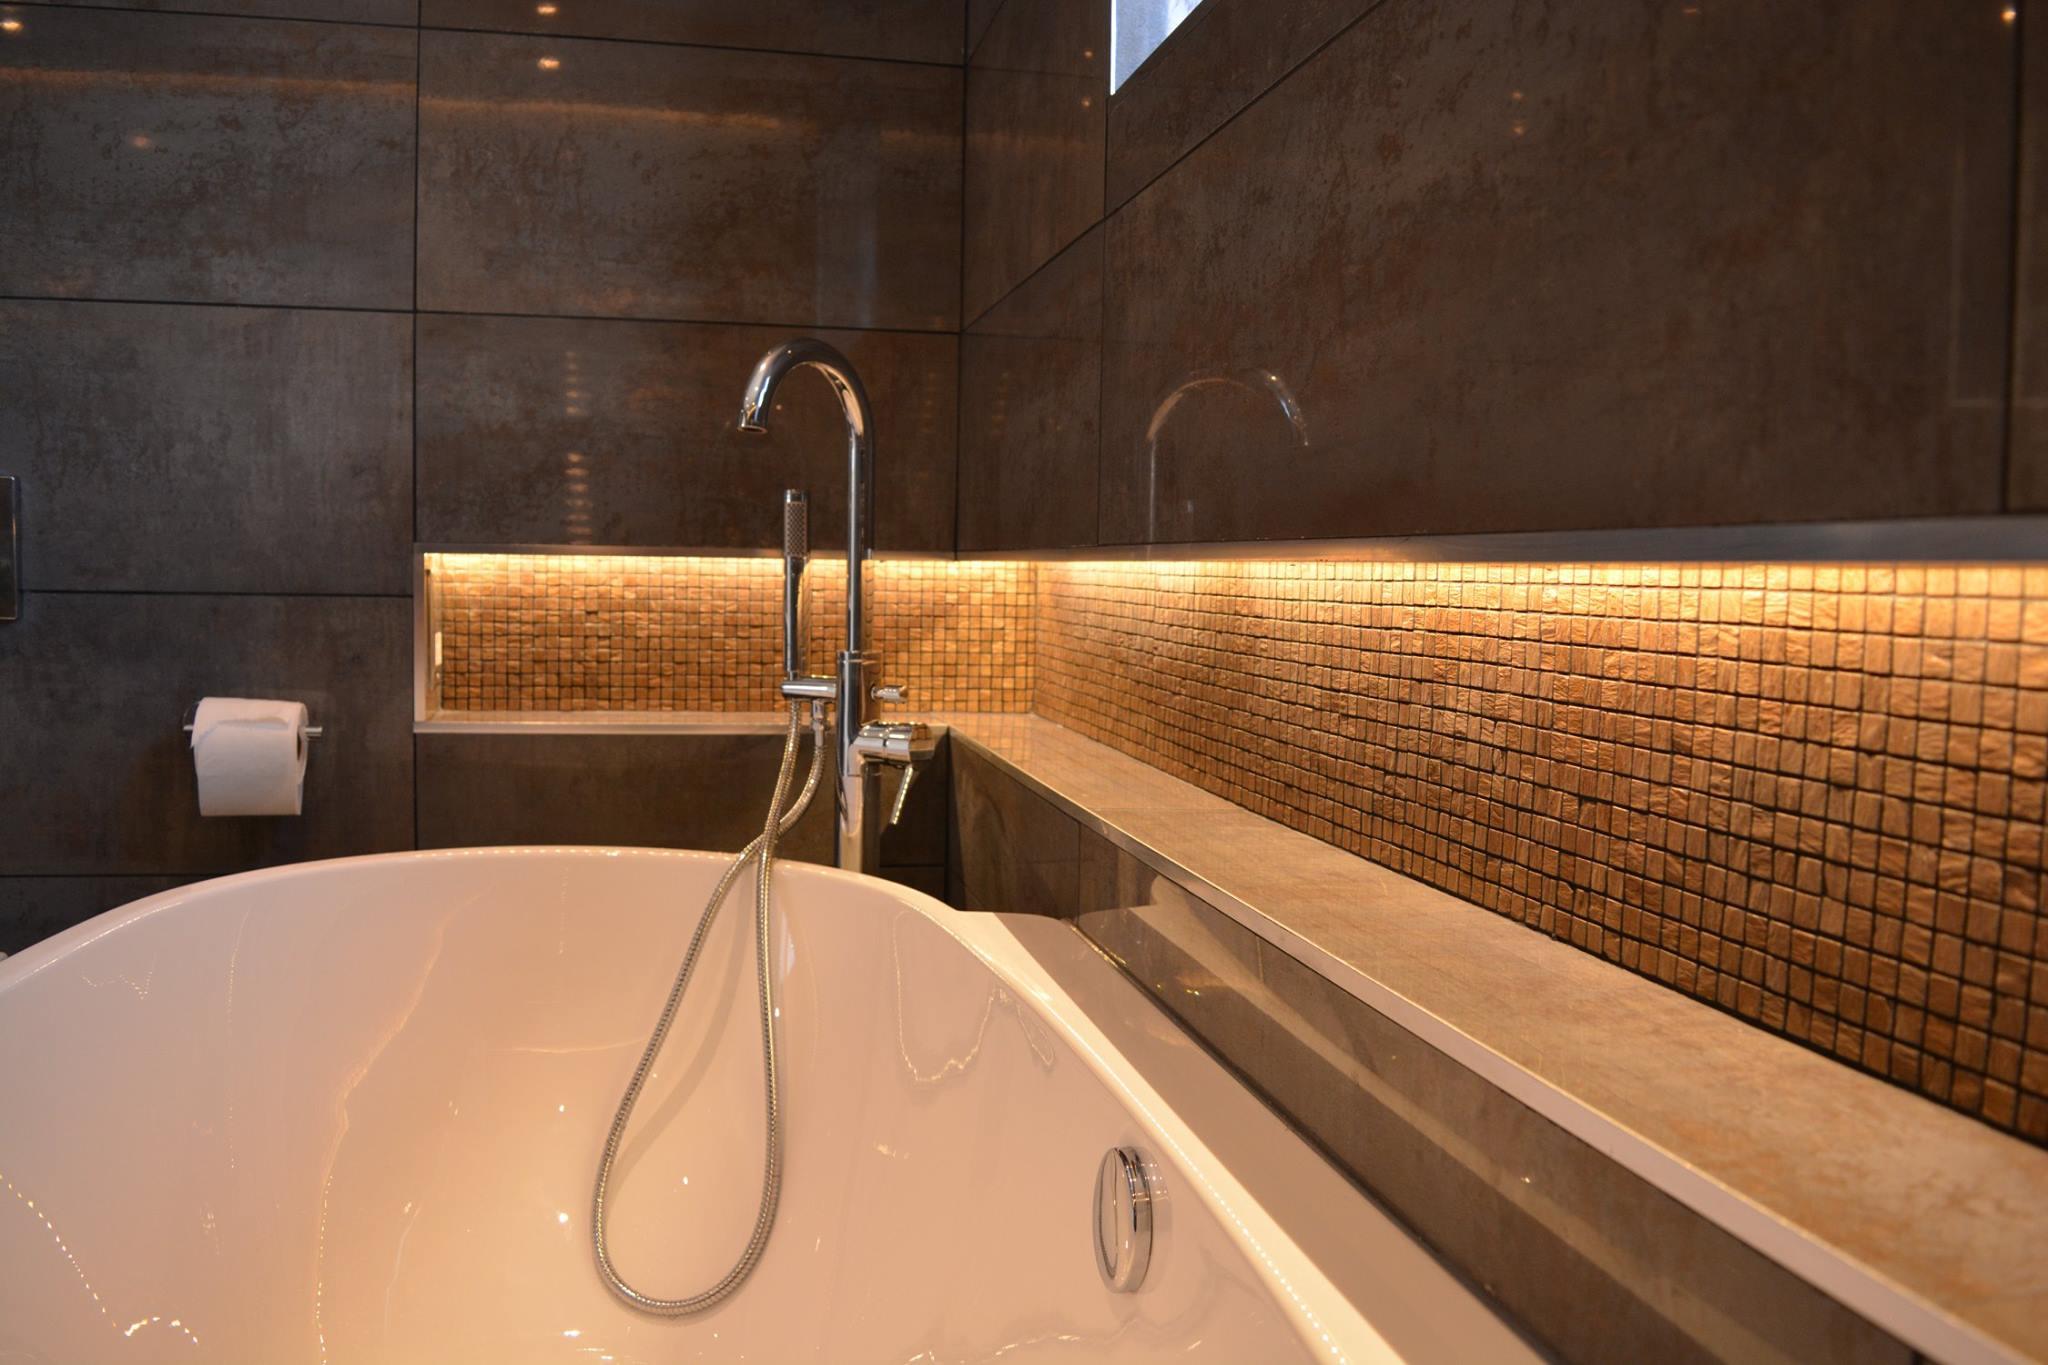 Porcelanosa bathroom renewal for Porcelanosa bathrooms prices